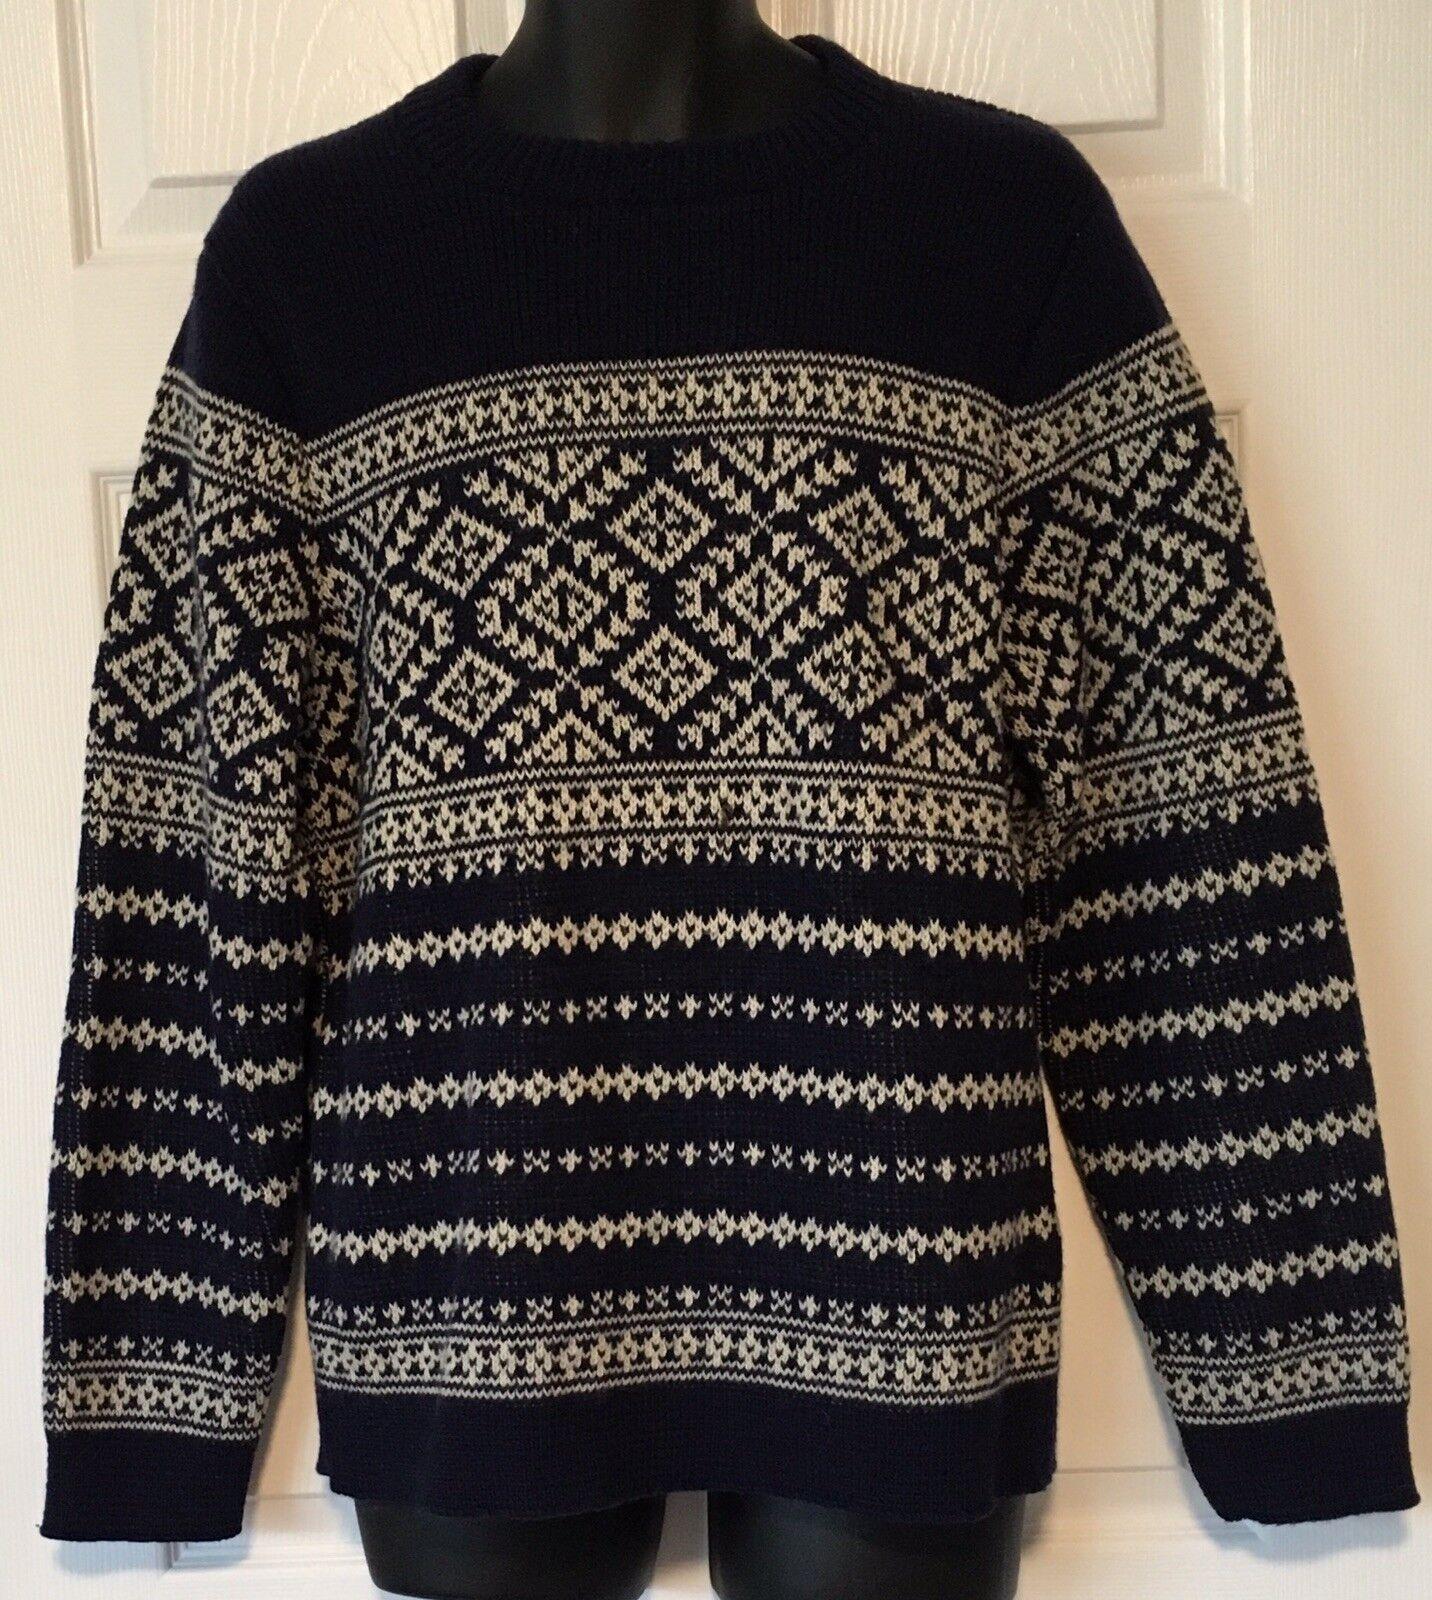 ALPS Knitmeister Ski Sweater Fair Isle Knit Pattern Navy bluee Ivory Men's Sz L